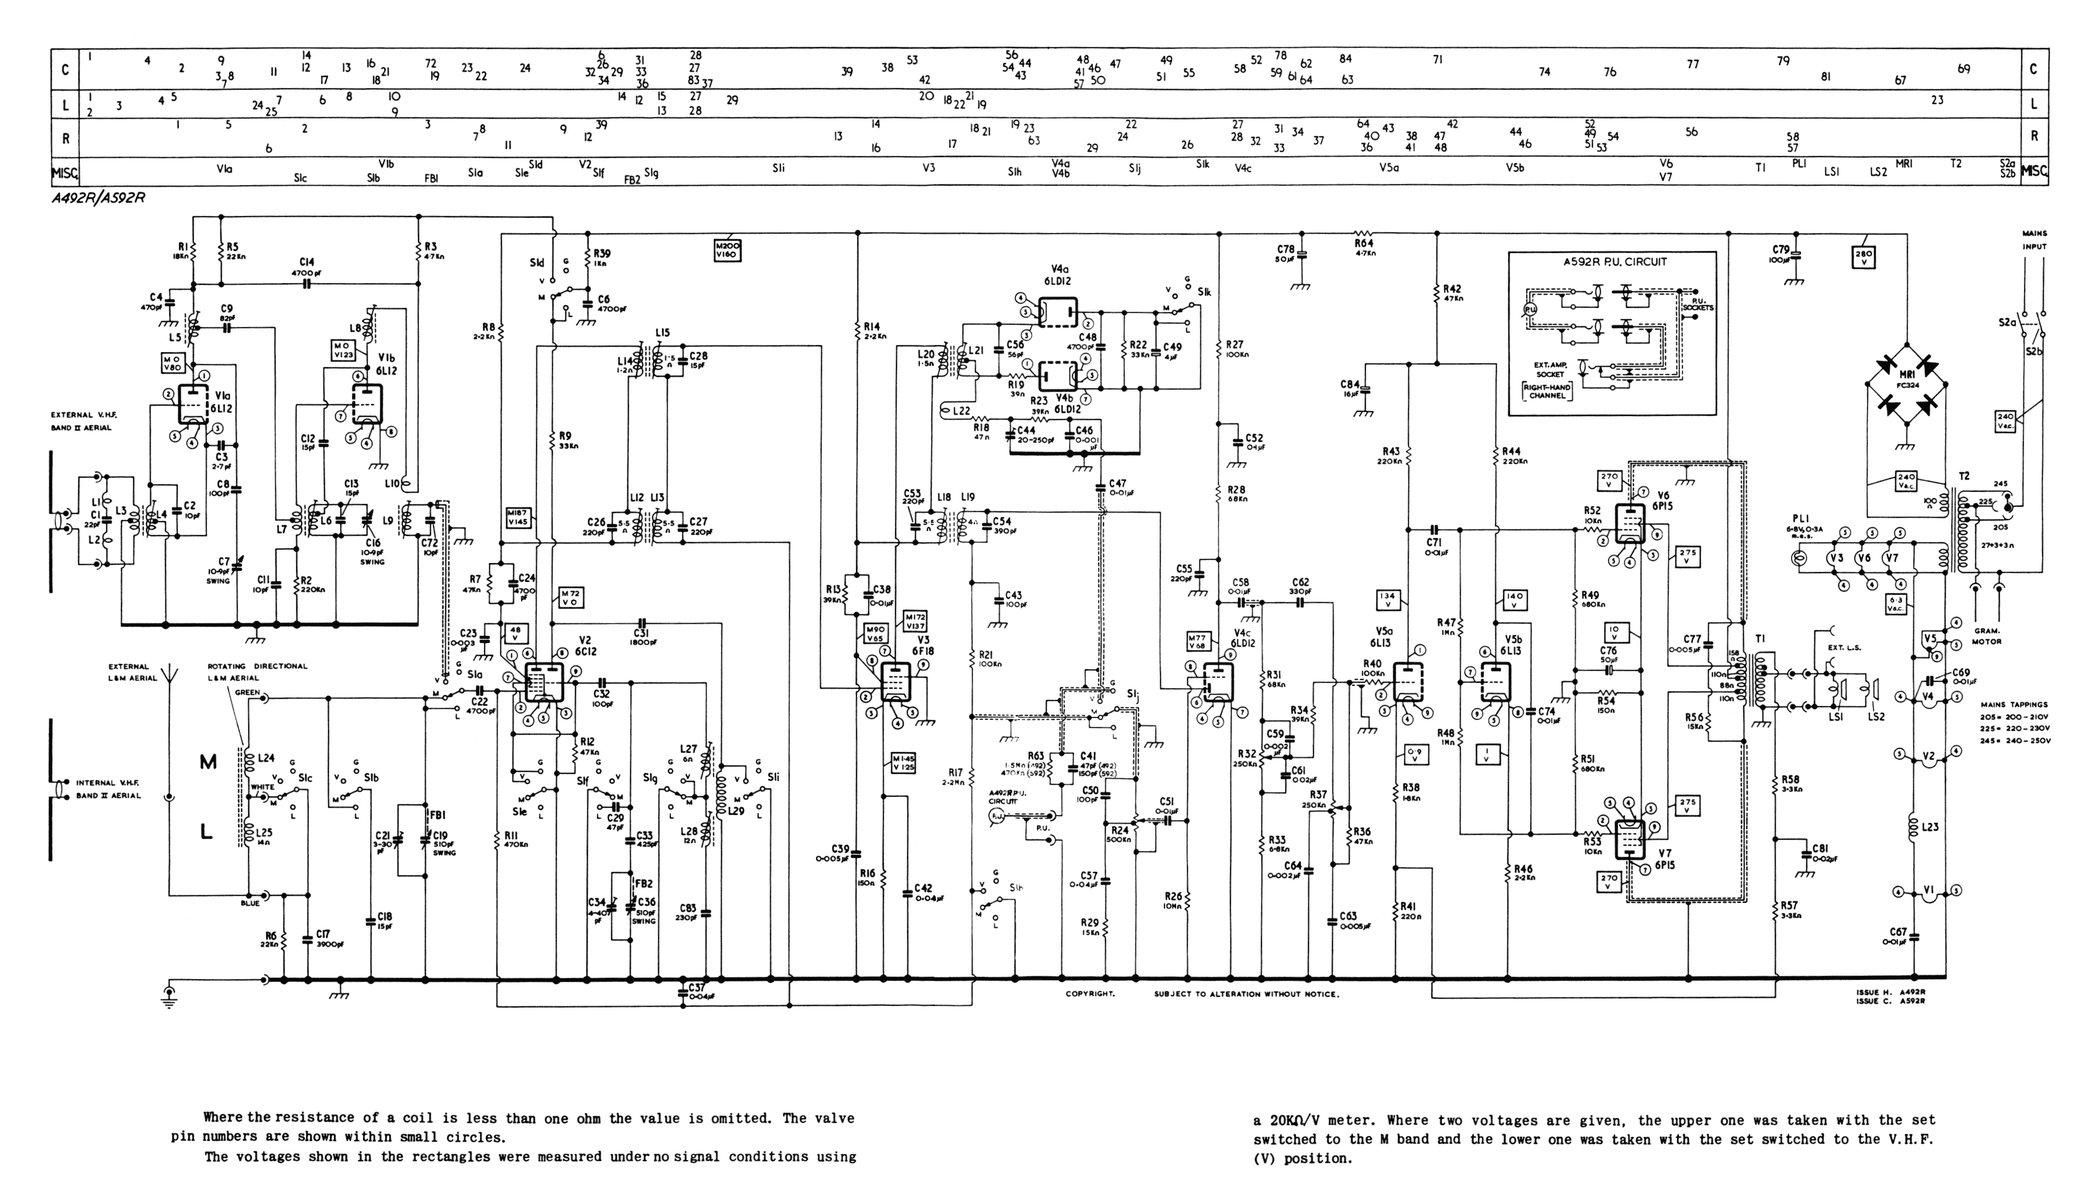 221 Murphy Switch Wiring Diagram - New Era Of Wiring Diagram • on gibson wiring diagrams, mitchell wiring diagrams, lucas wiring diagrams,